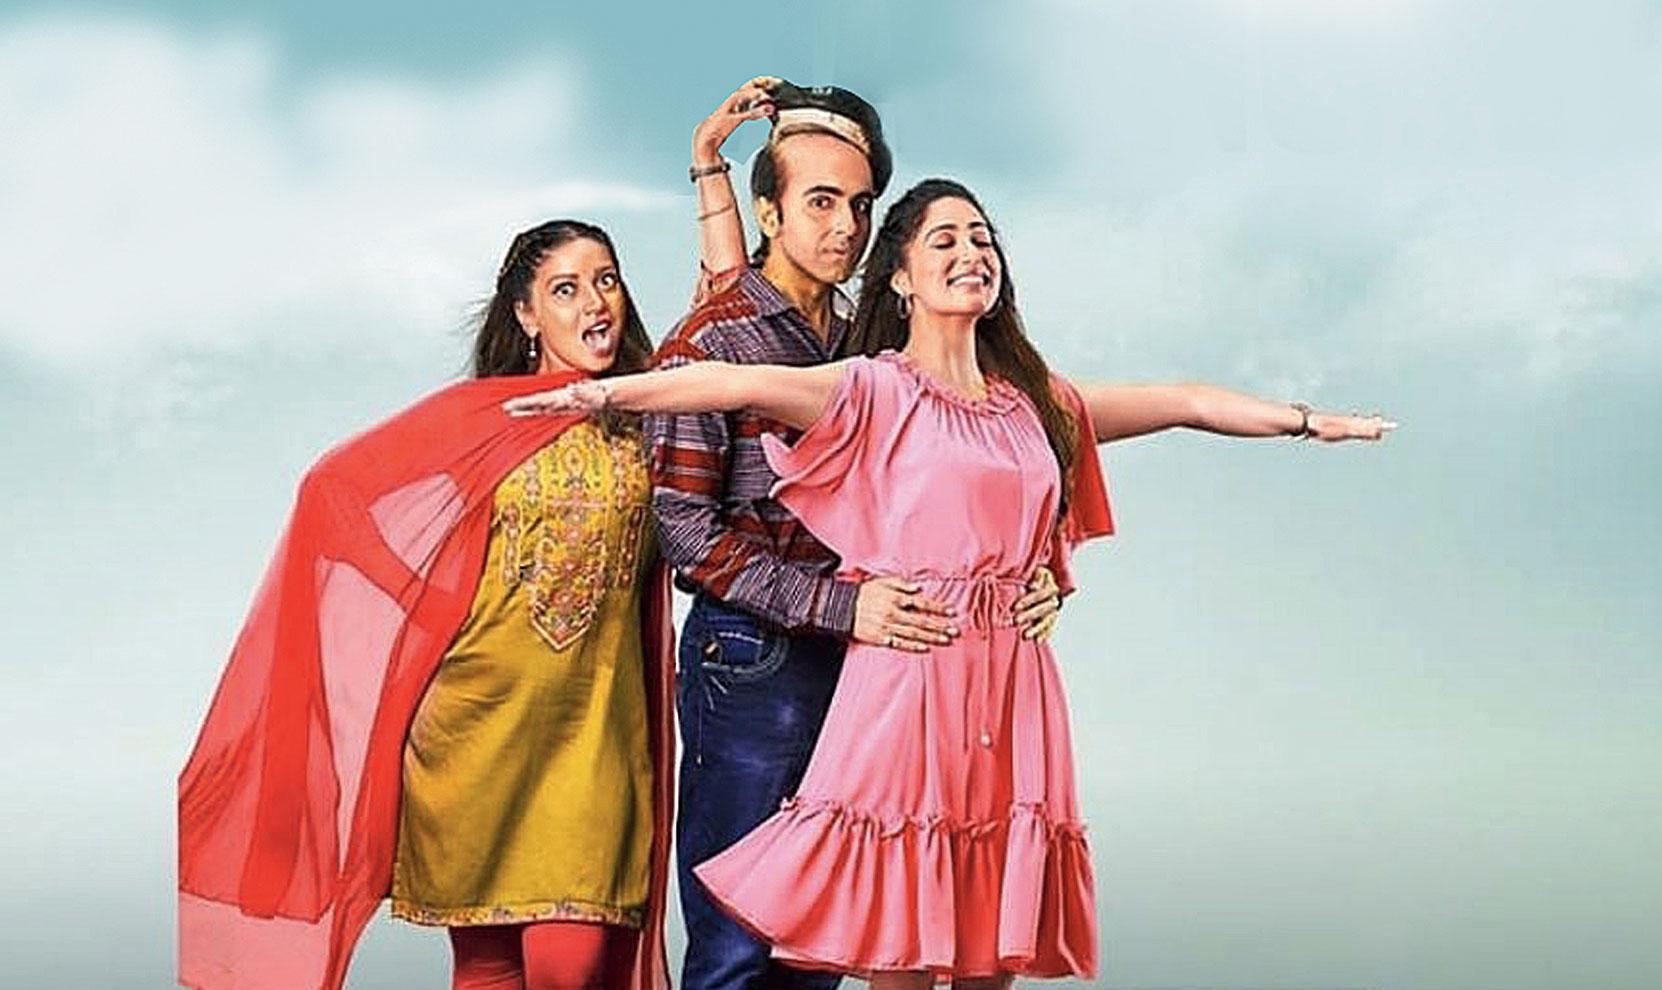 Bhumi Pednekar, Ayushmann Khurrana and Yami Gautam in Bala, now playing in cinemas